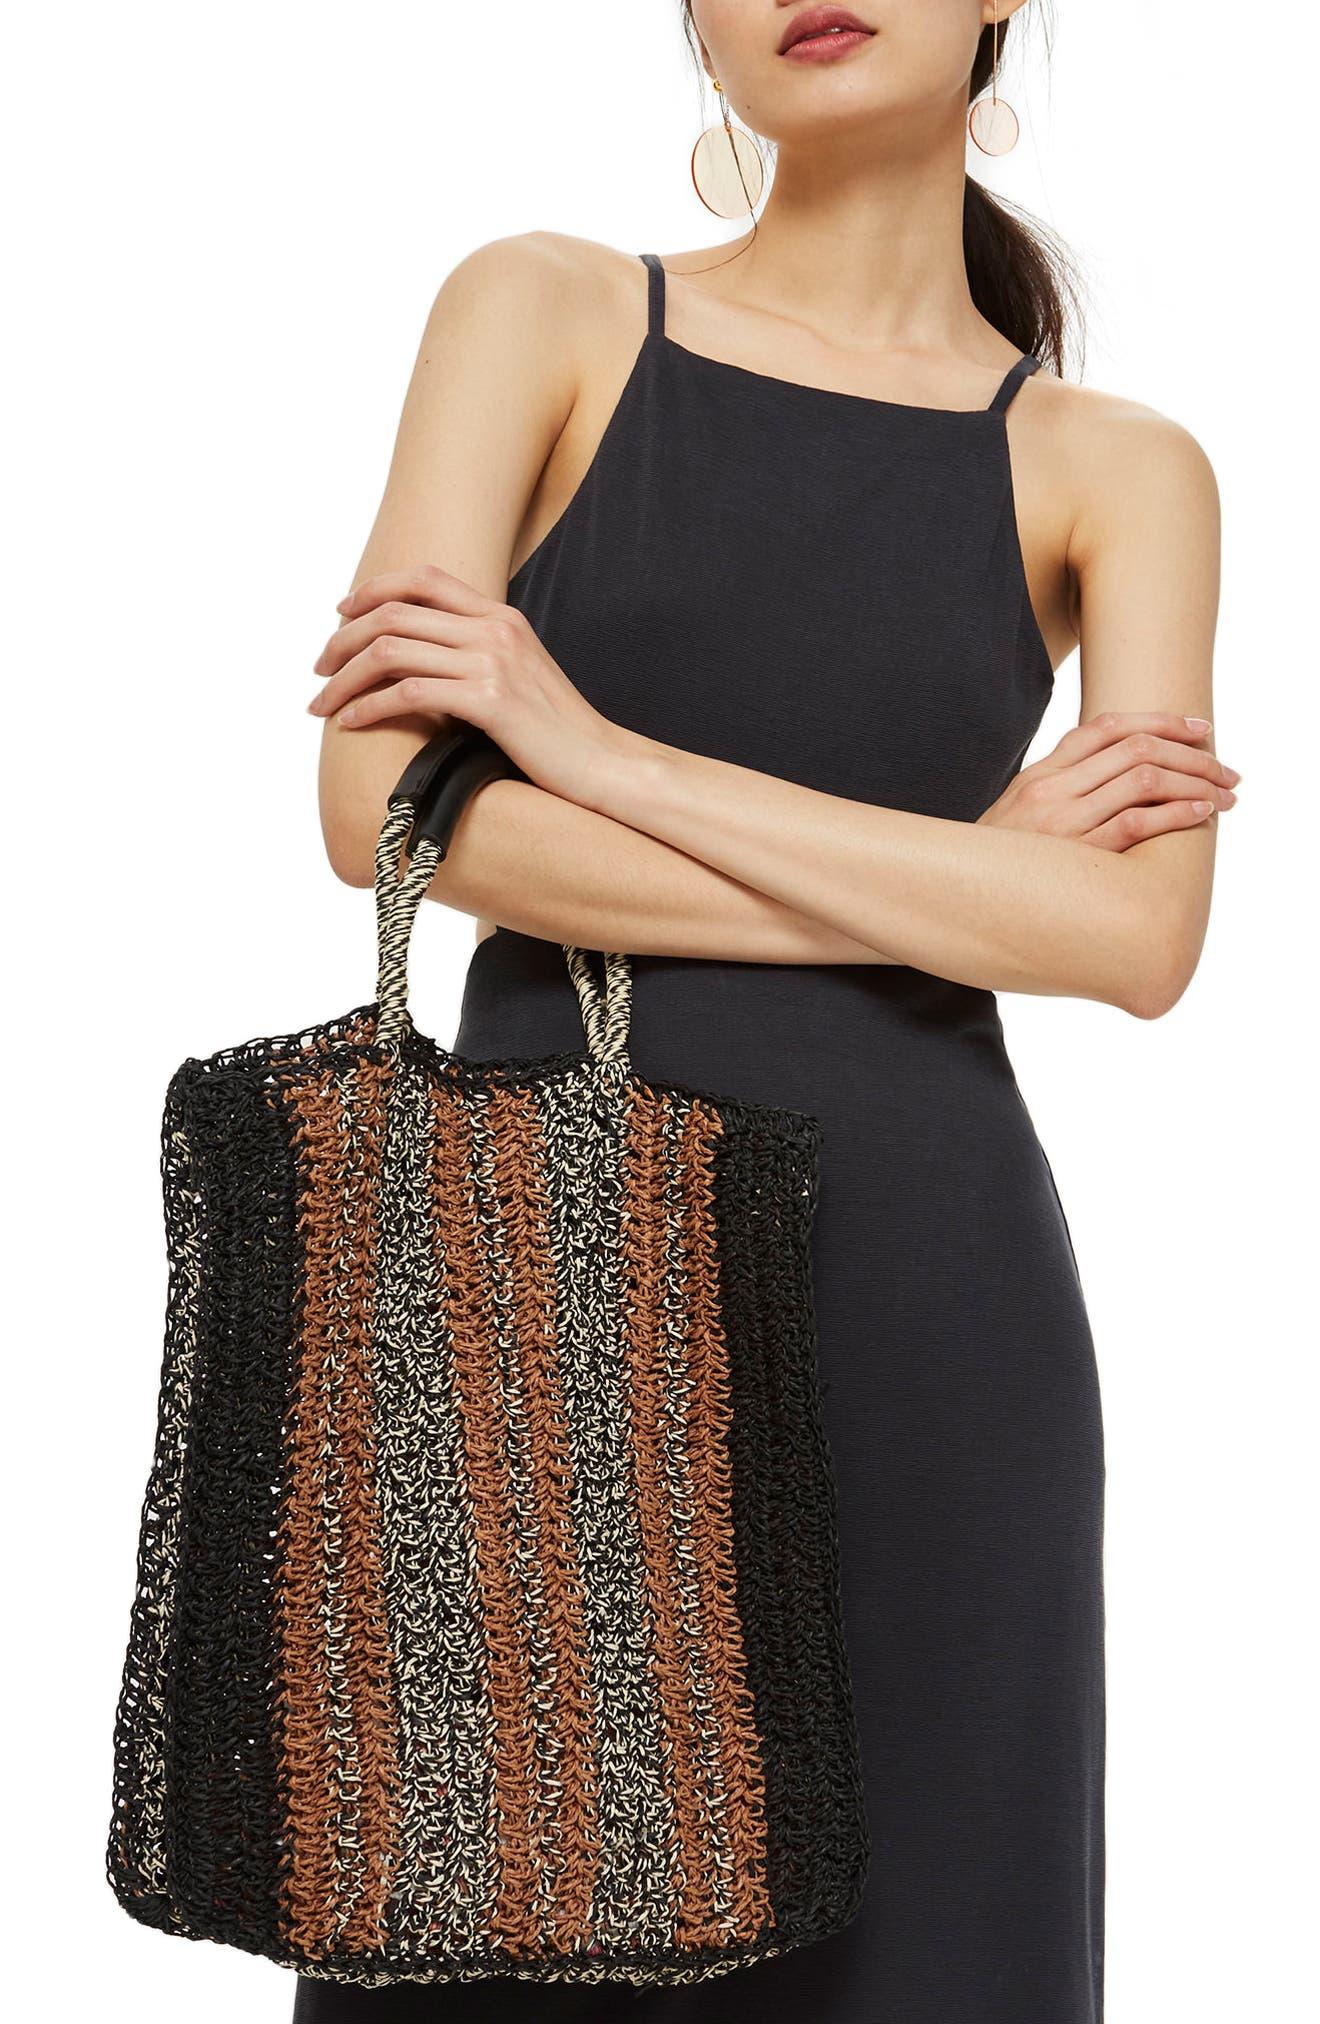 Bath Stripe Straw Tote Bag,                             Alternate thumbnail 2, color,                             Black Multi